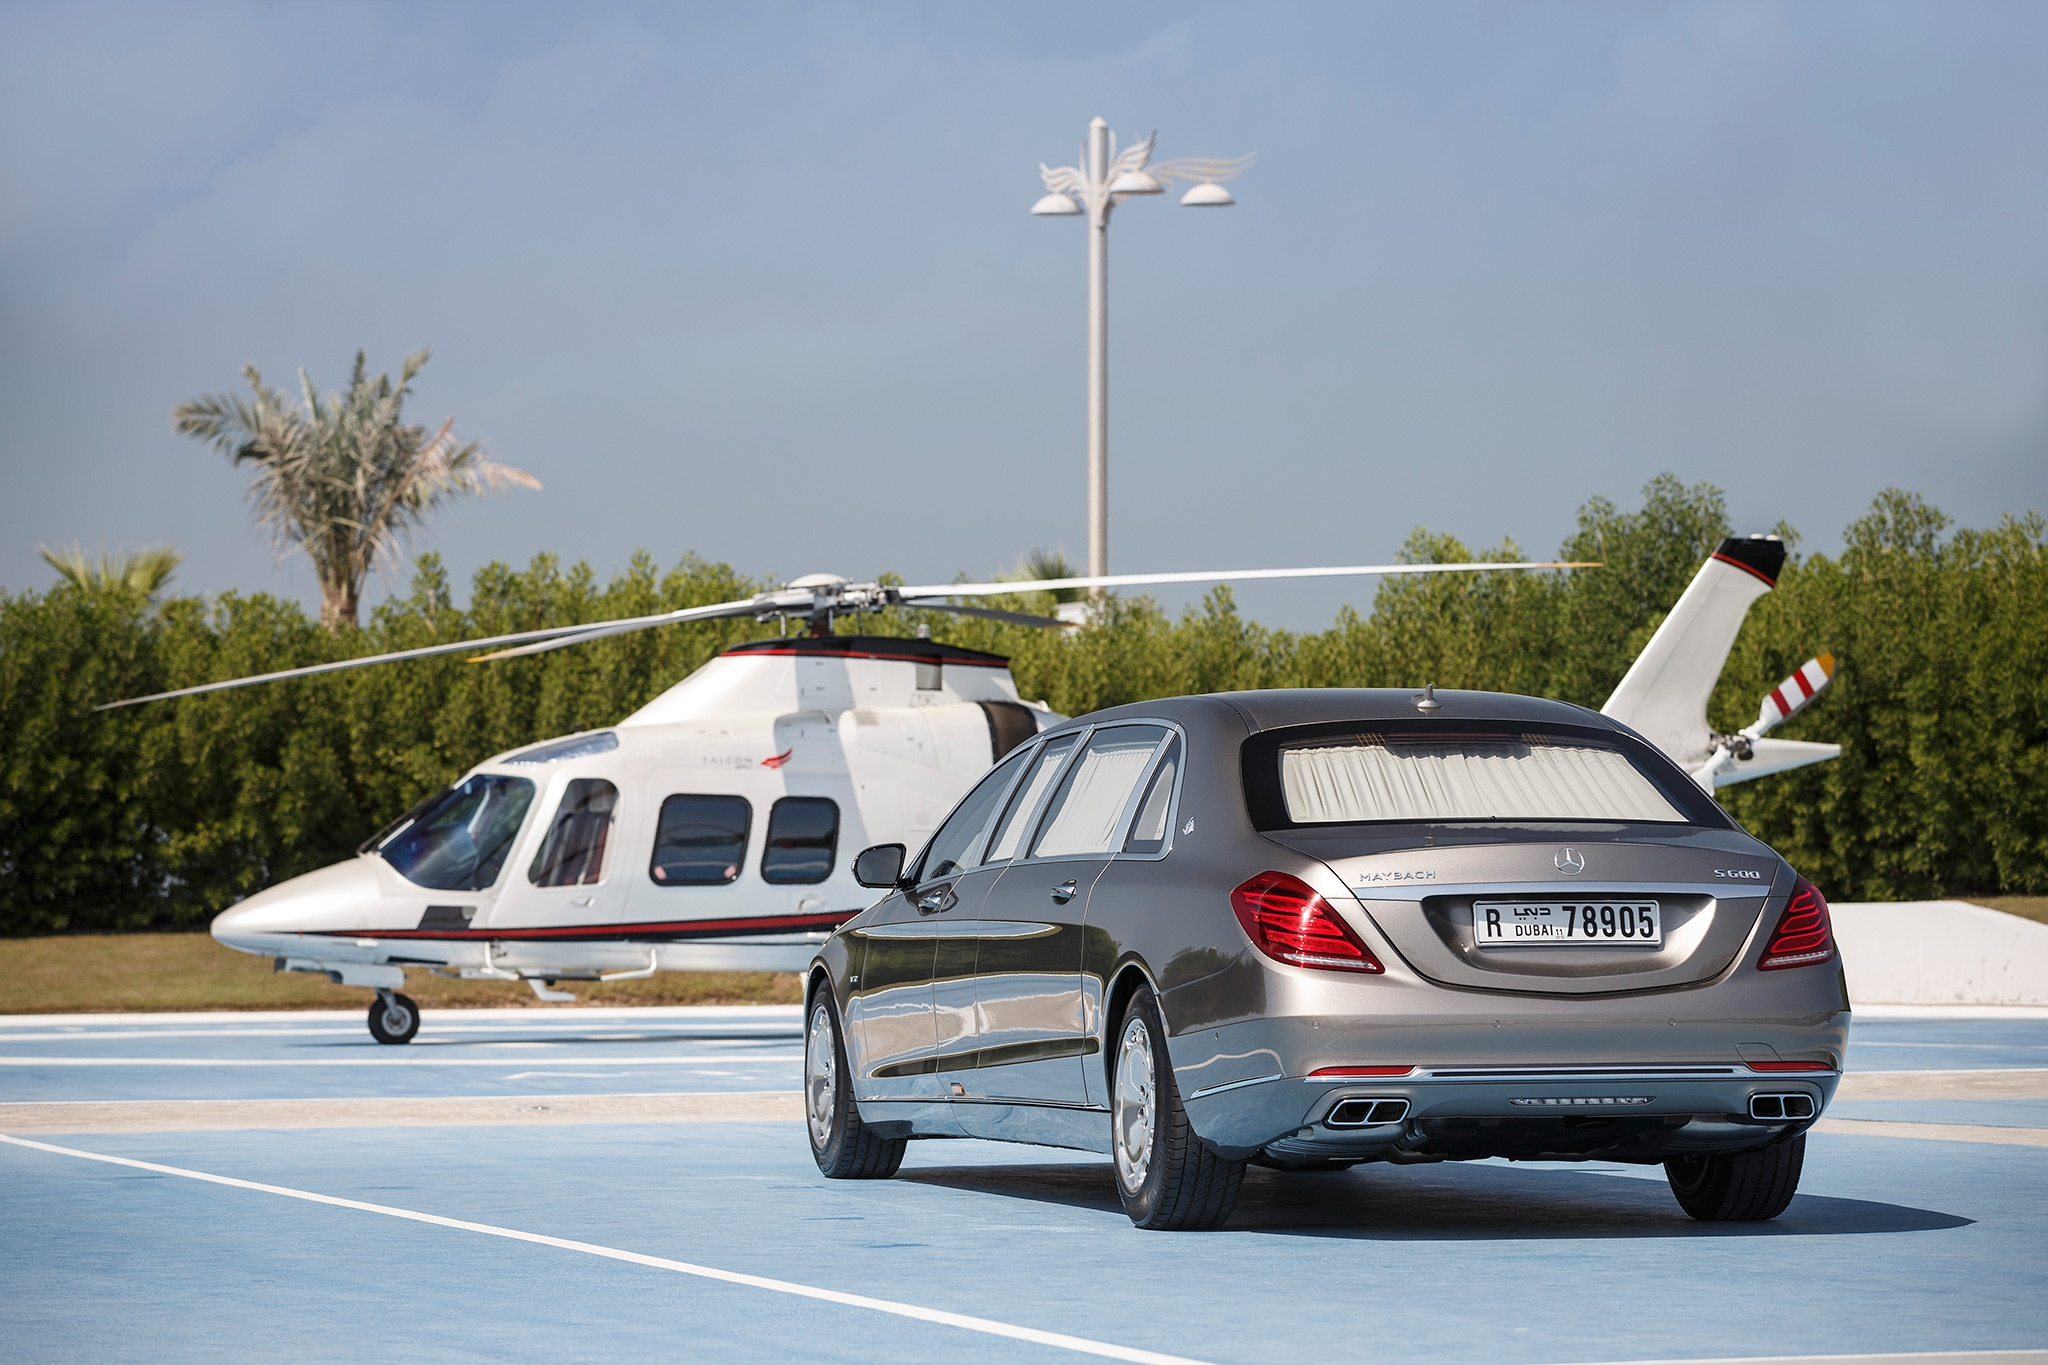 https://st.automobilemag.com/uploads/sites/11/2016/08/2016-Mercedes-Maybach-S600-Pullman-rear-three-quarter-03.jpg